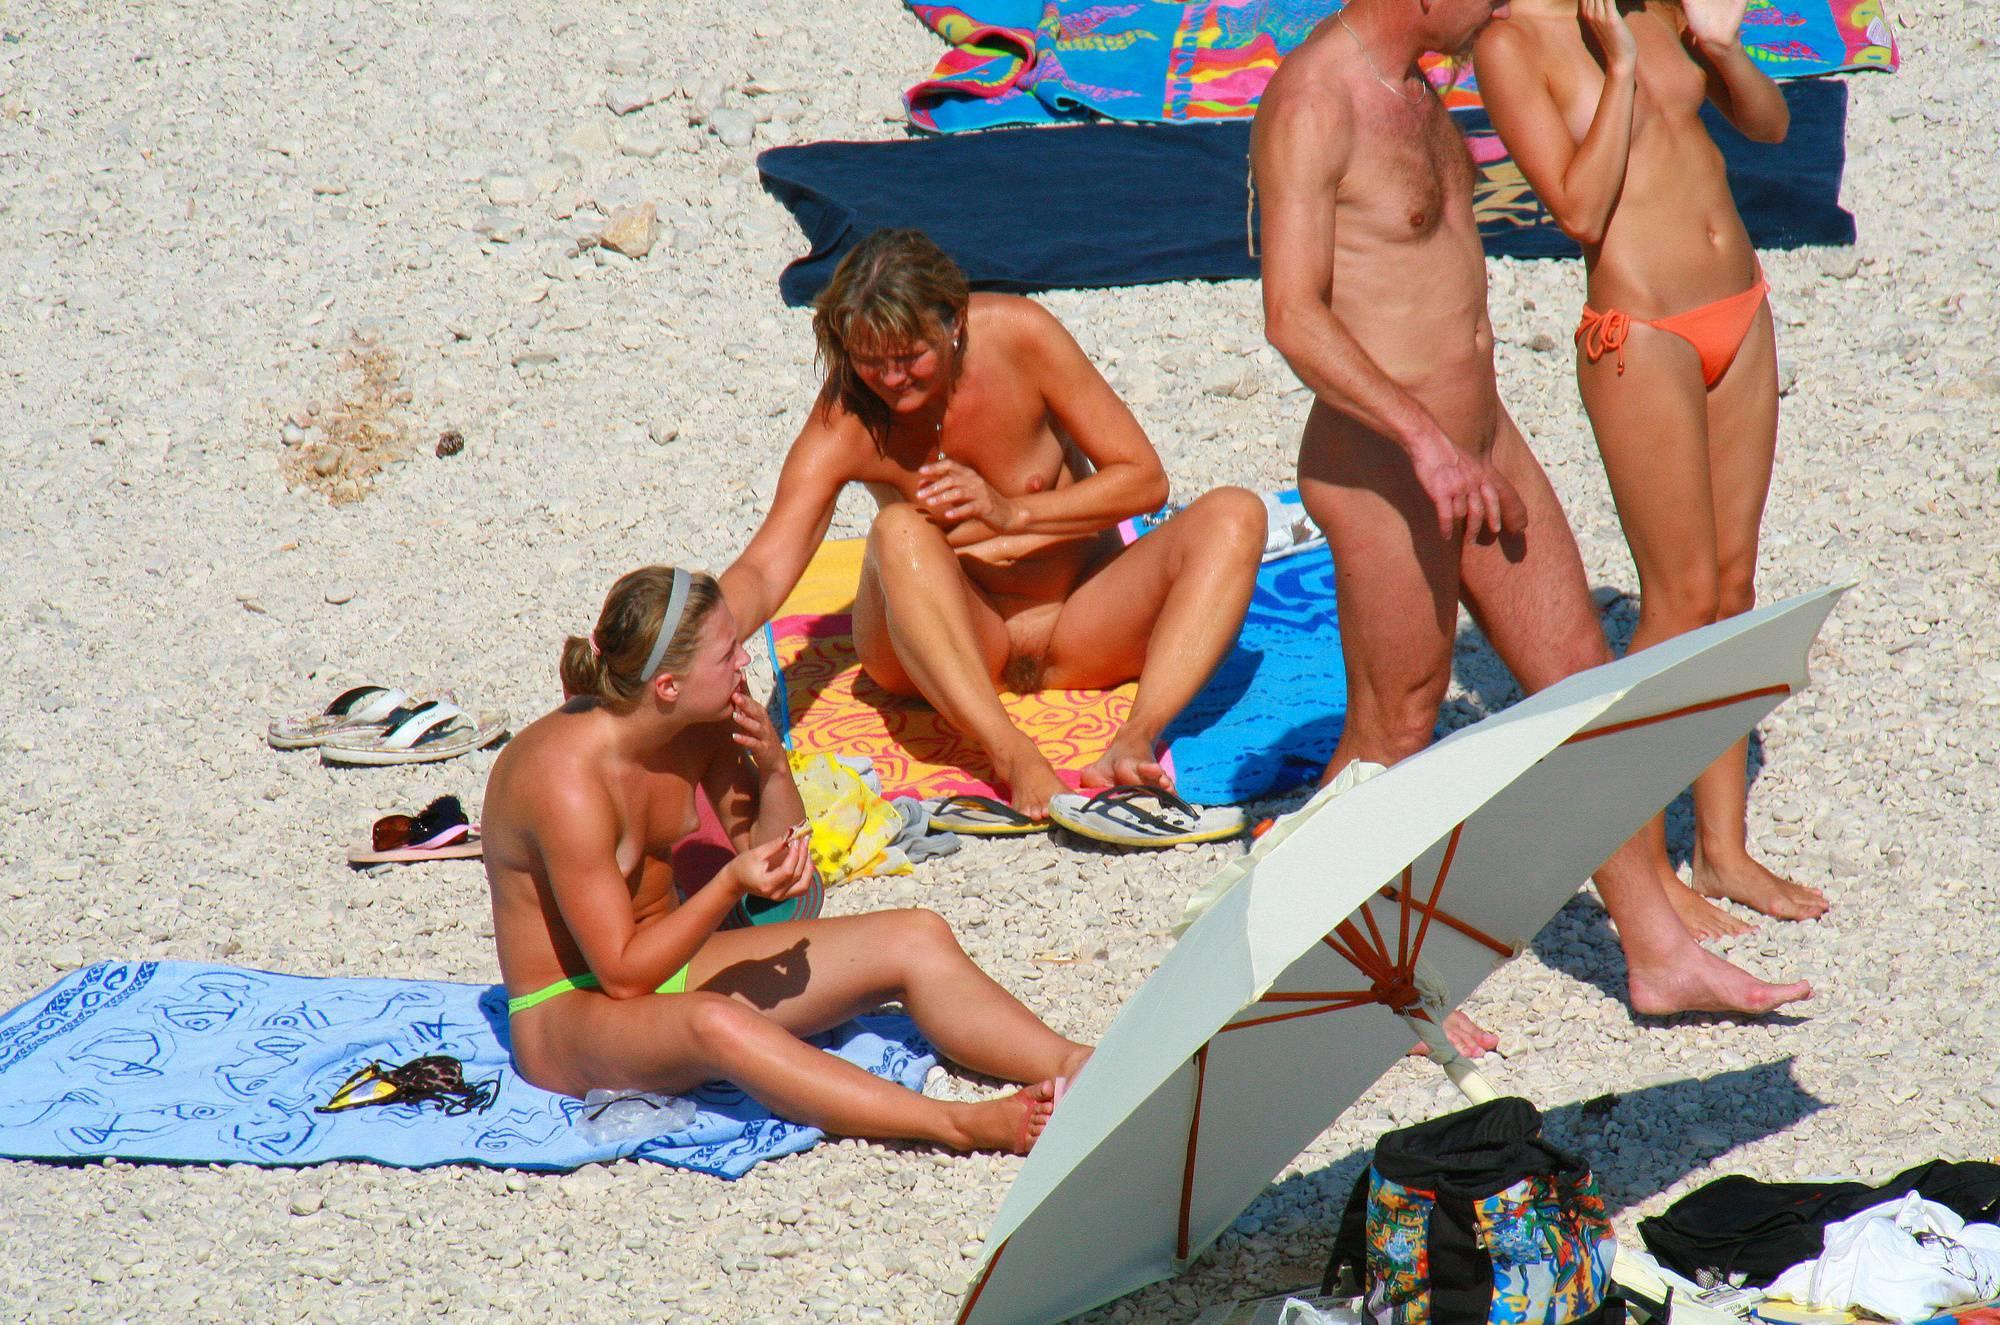 Ula FKK Topless Sister Site - 3